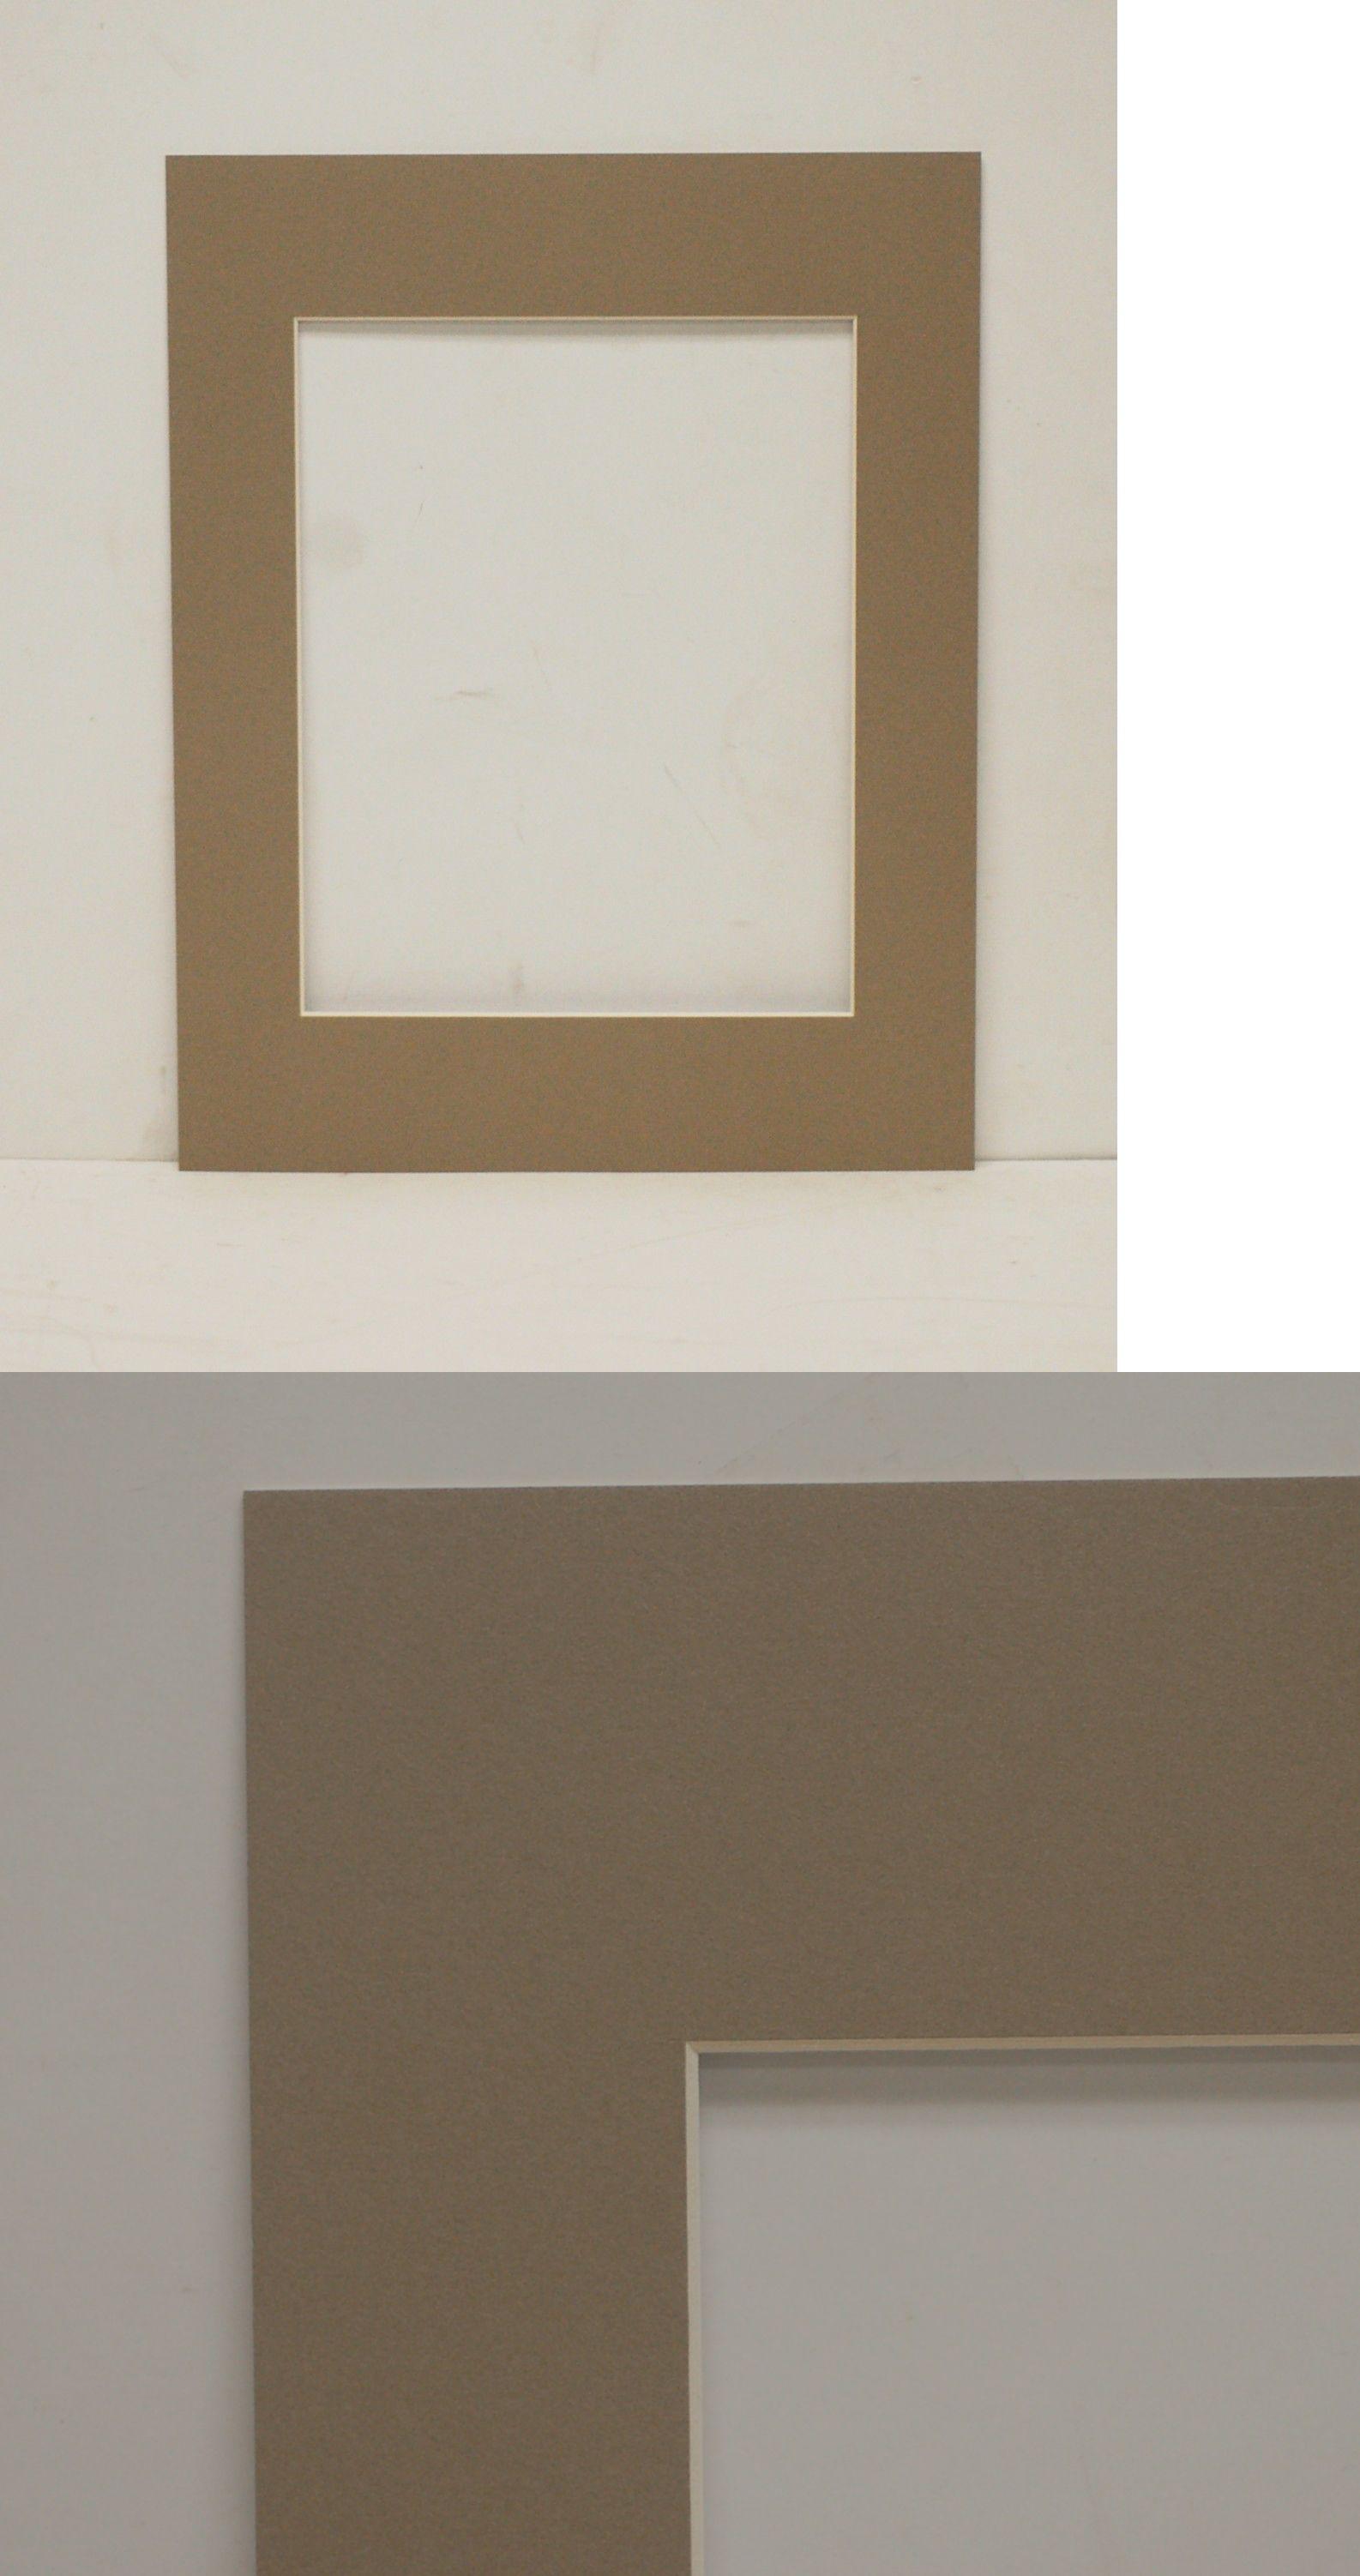 design blackwater mount board galleries framing cutting sam cutter samsung and mat csc